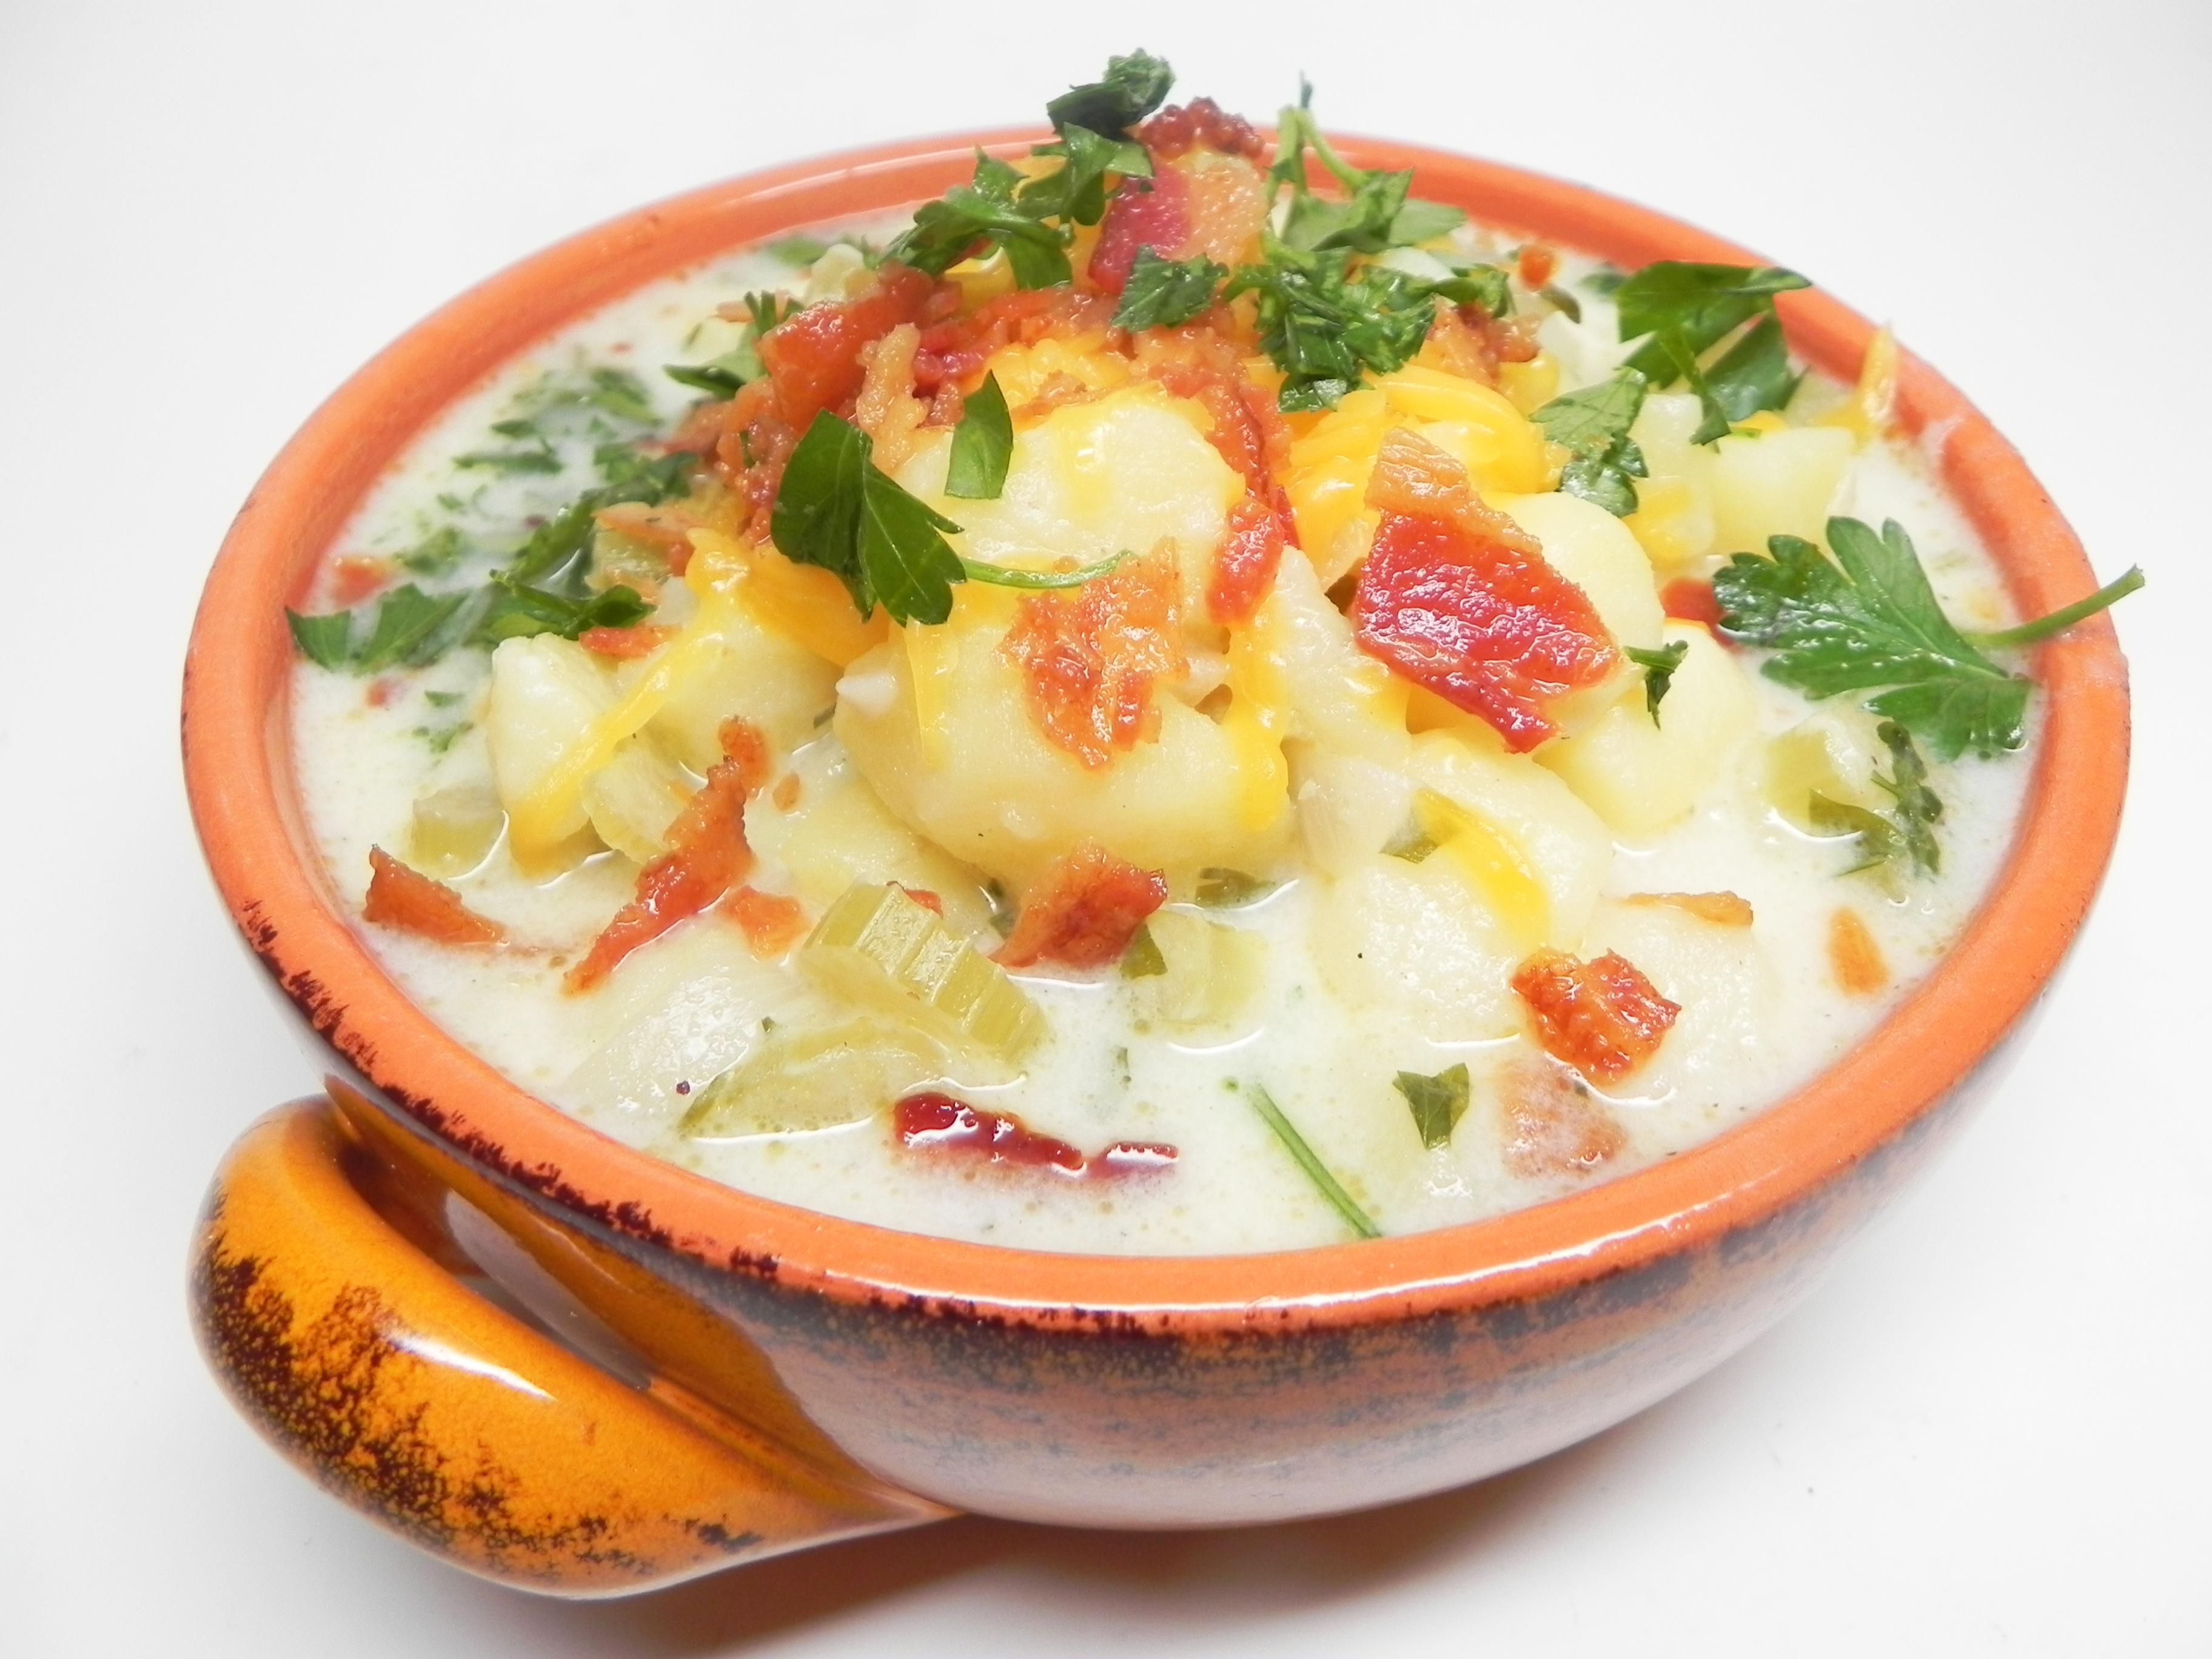 Kimmy's Potato Soup Kimberly